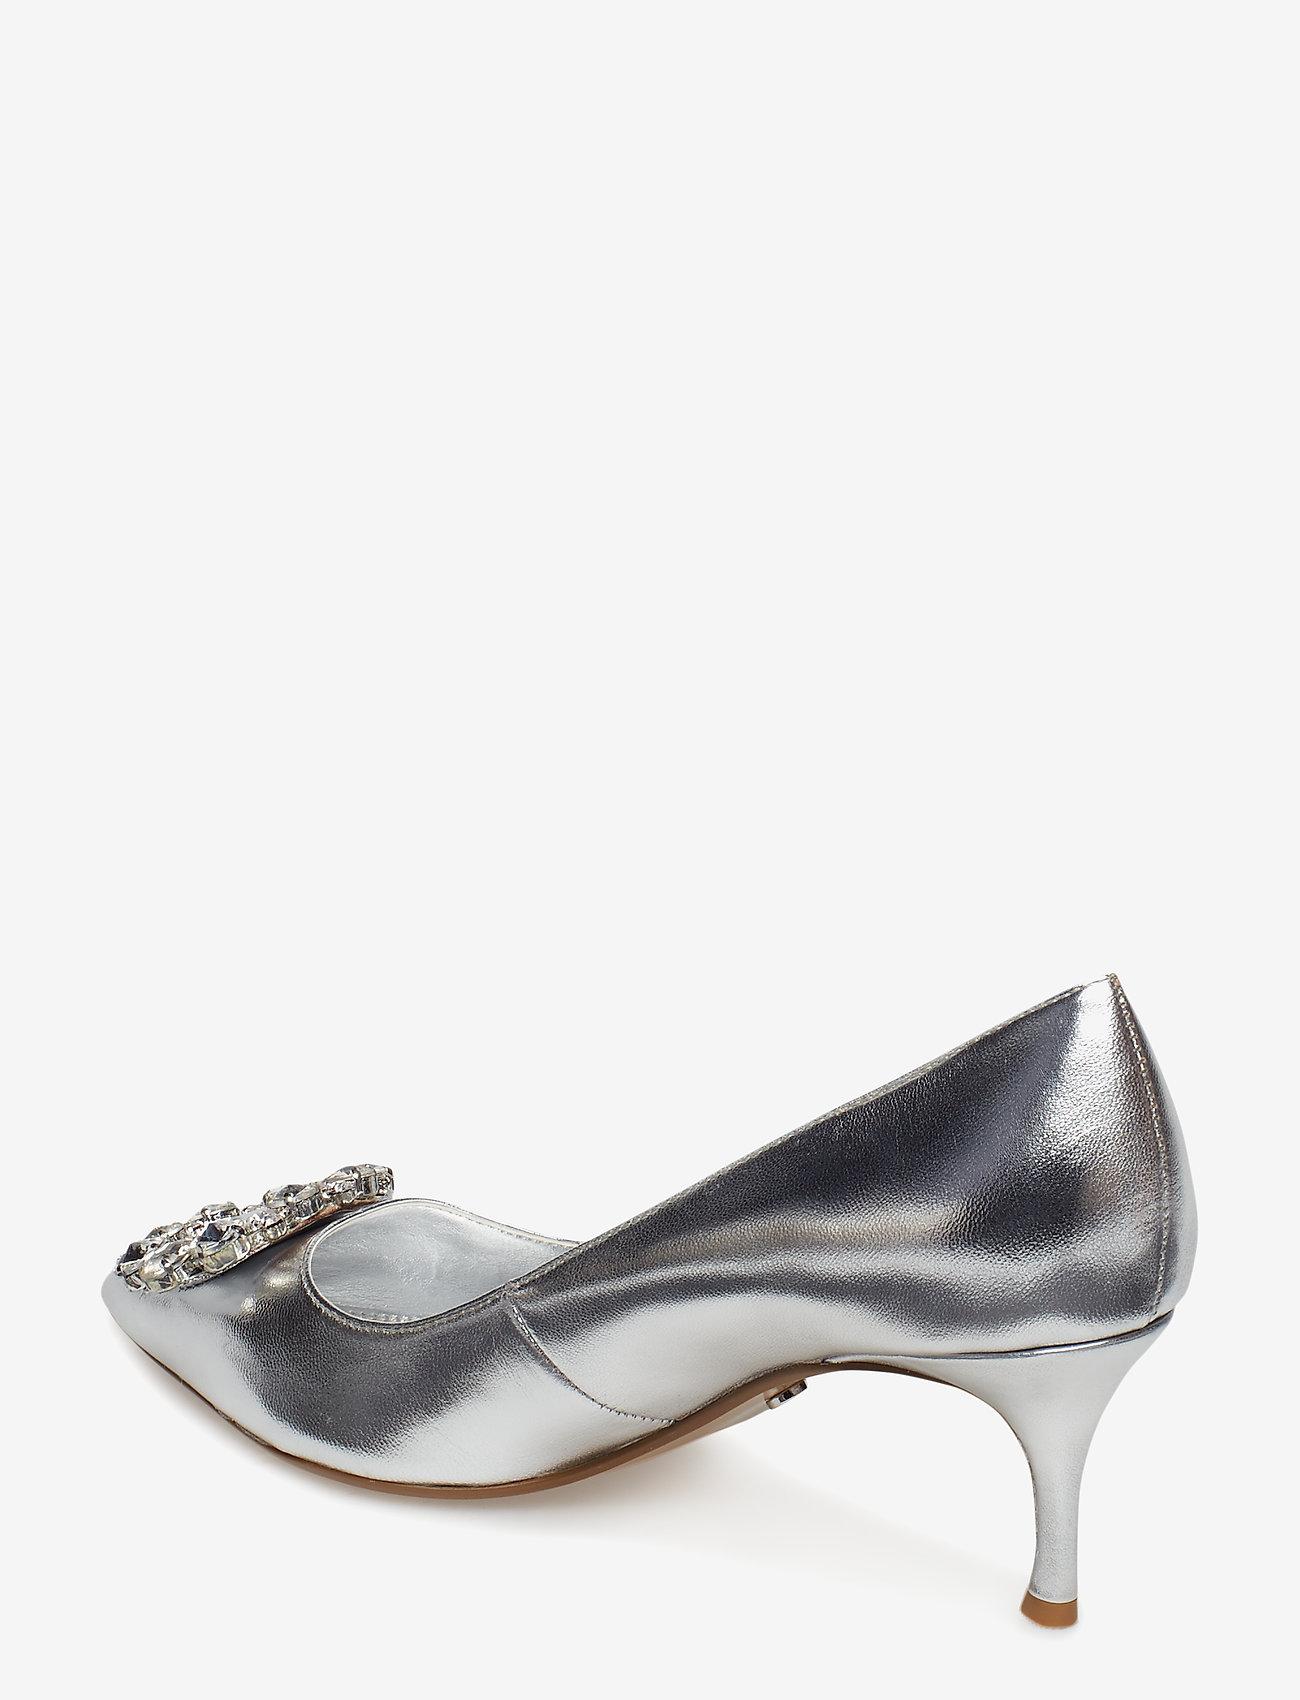 Beaula (Silver-metallic) - Dune London